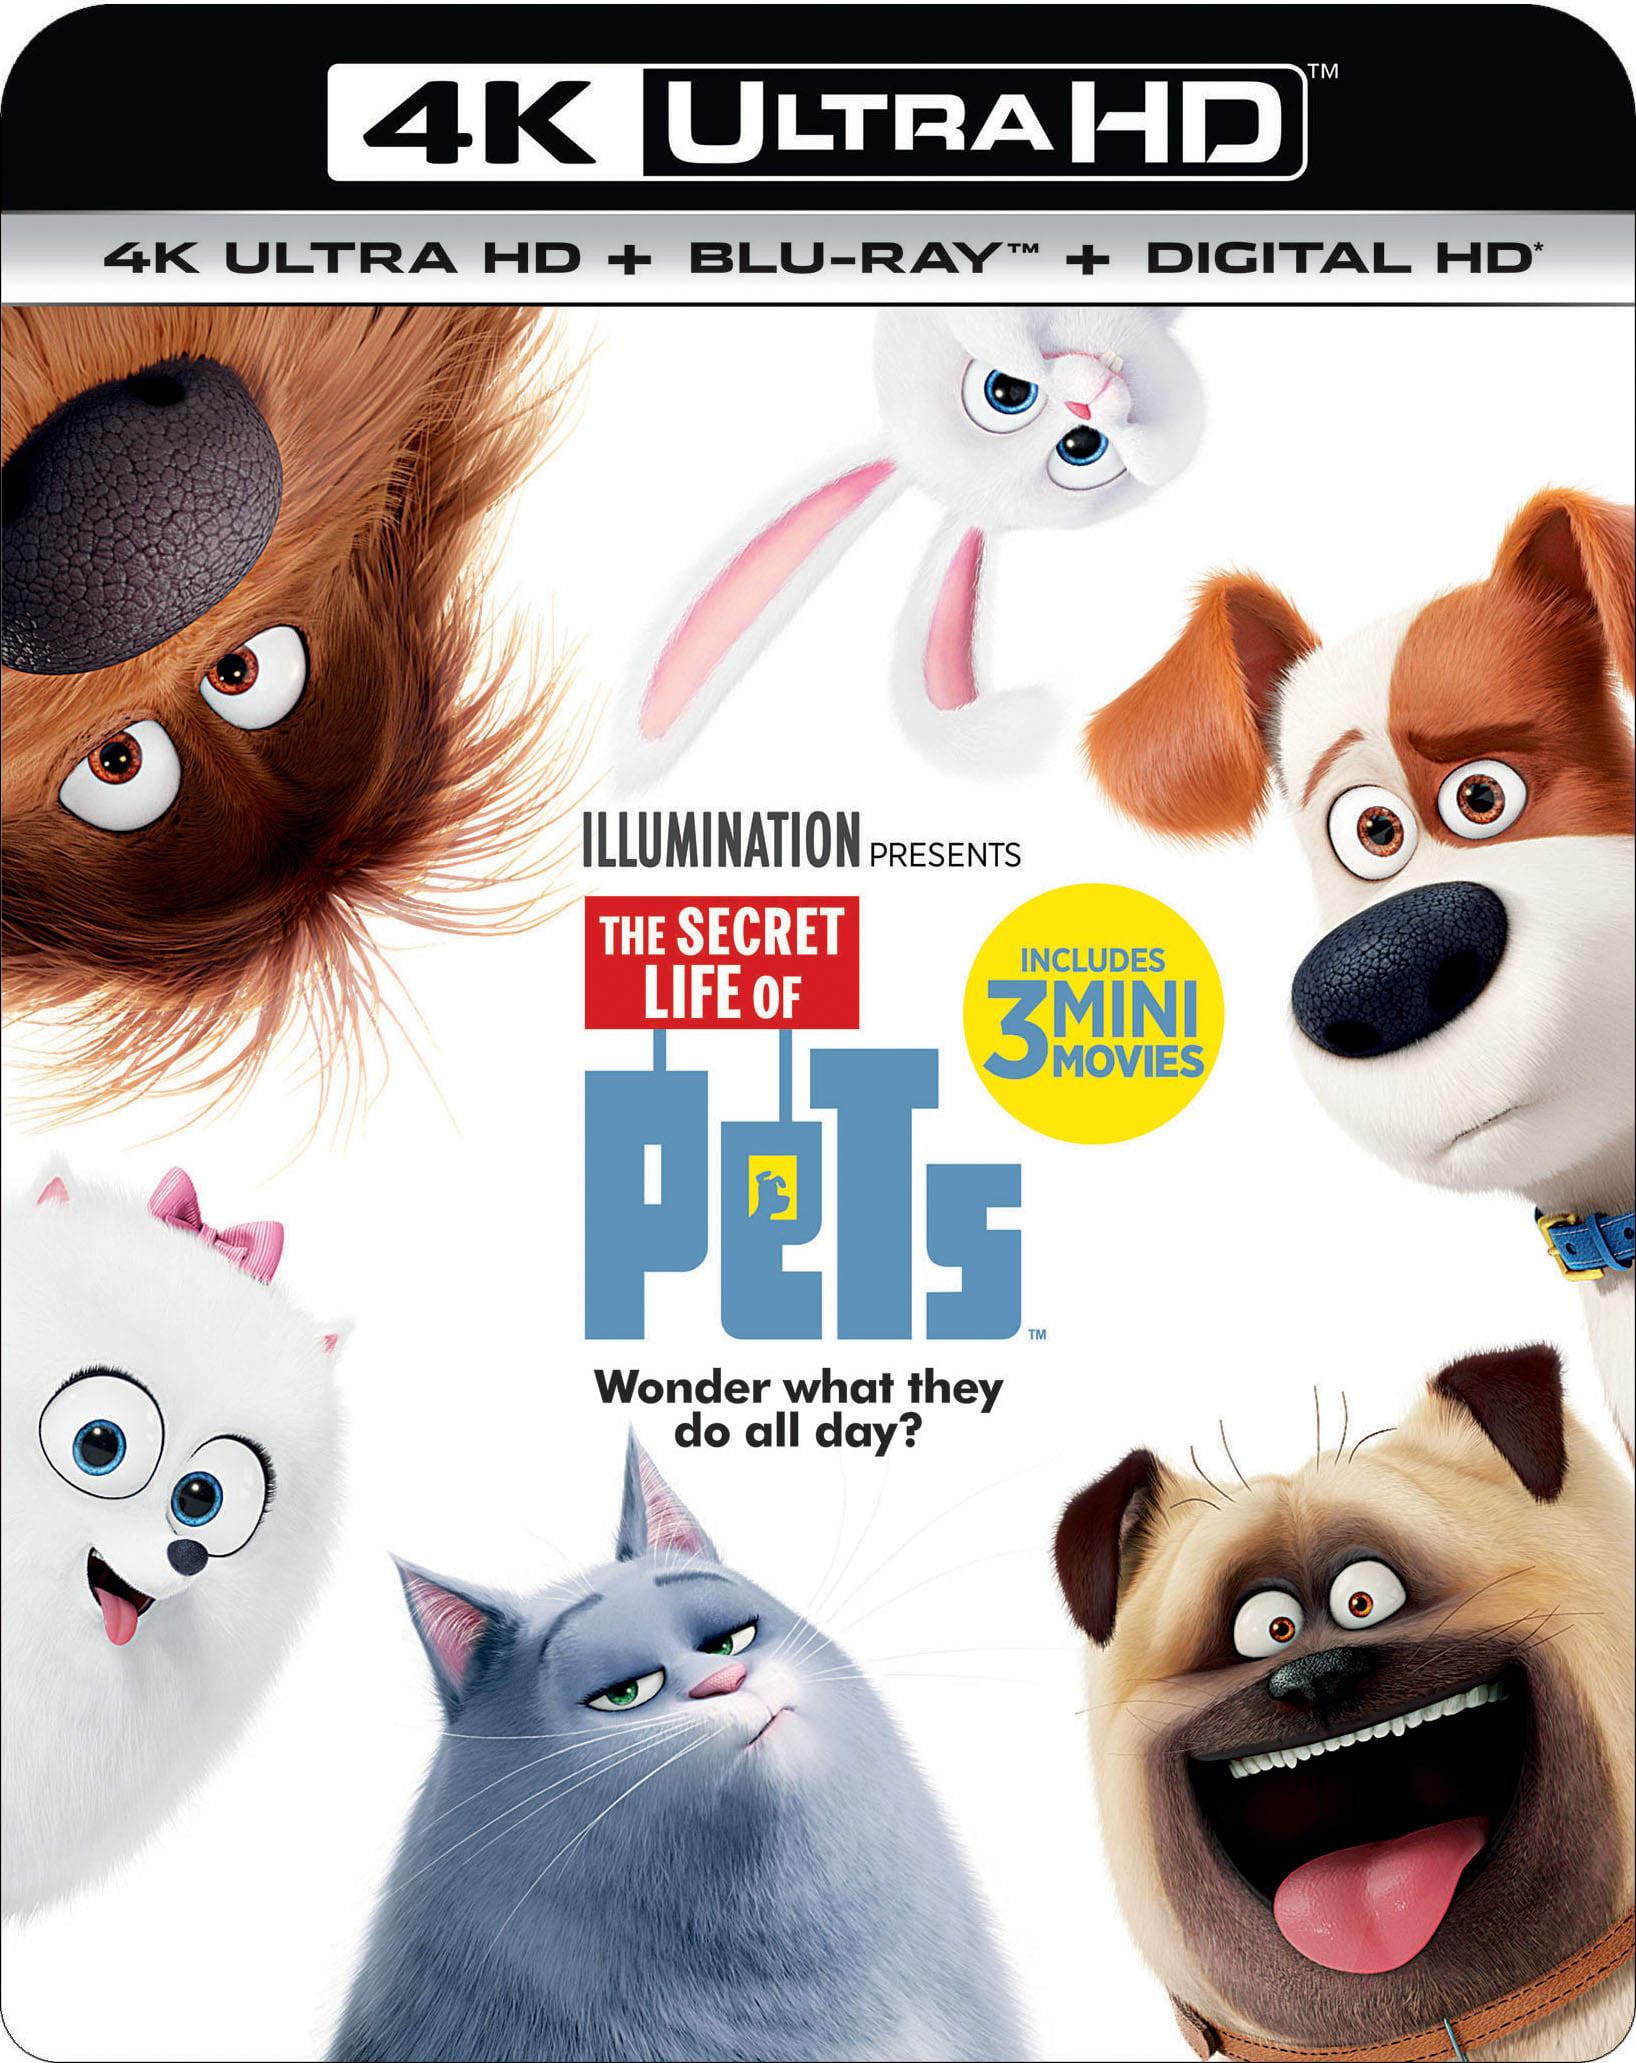 The Secret Life of Pets (4K Ultra HD + Blu-ray + Digital) $9.89 + Free Shipping @ Gruv